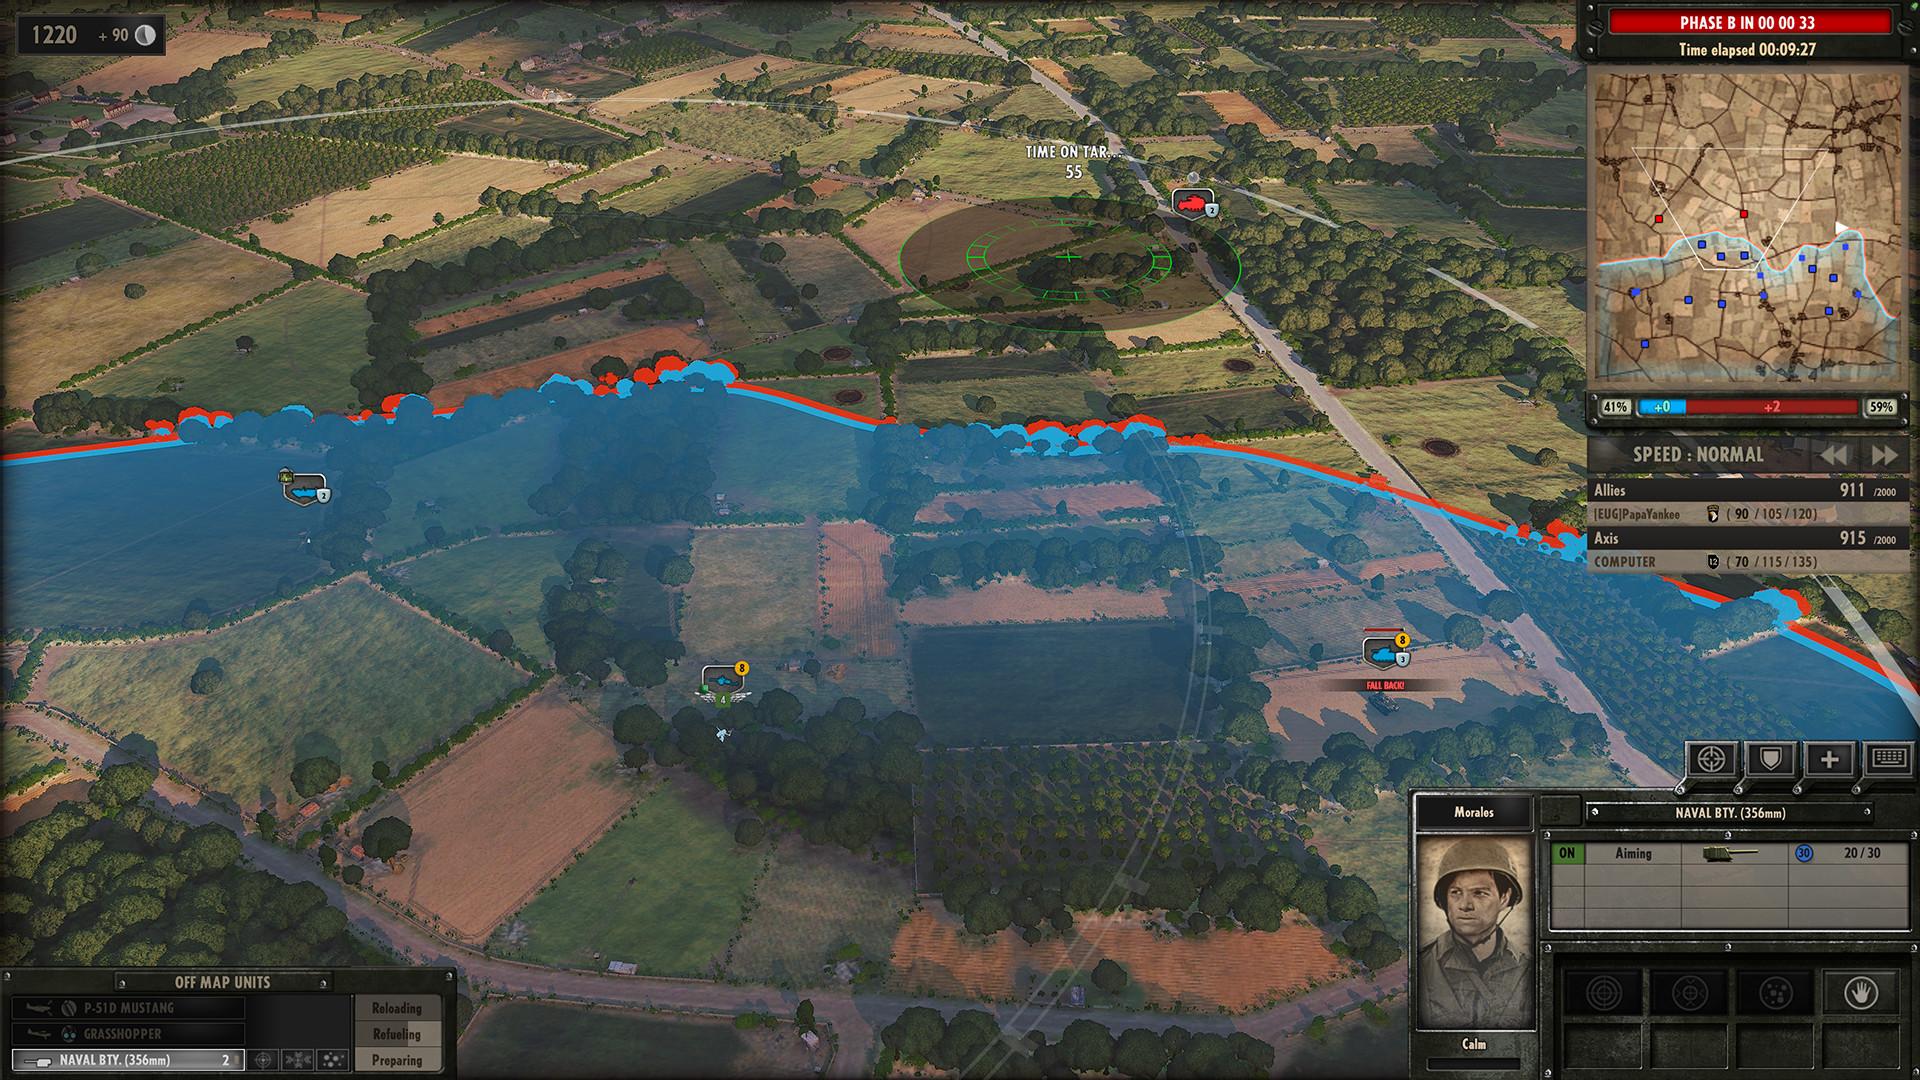 Steel Division: Normandy 44 Screenshot 3